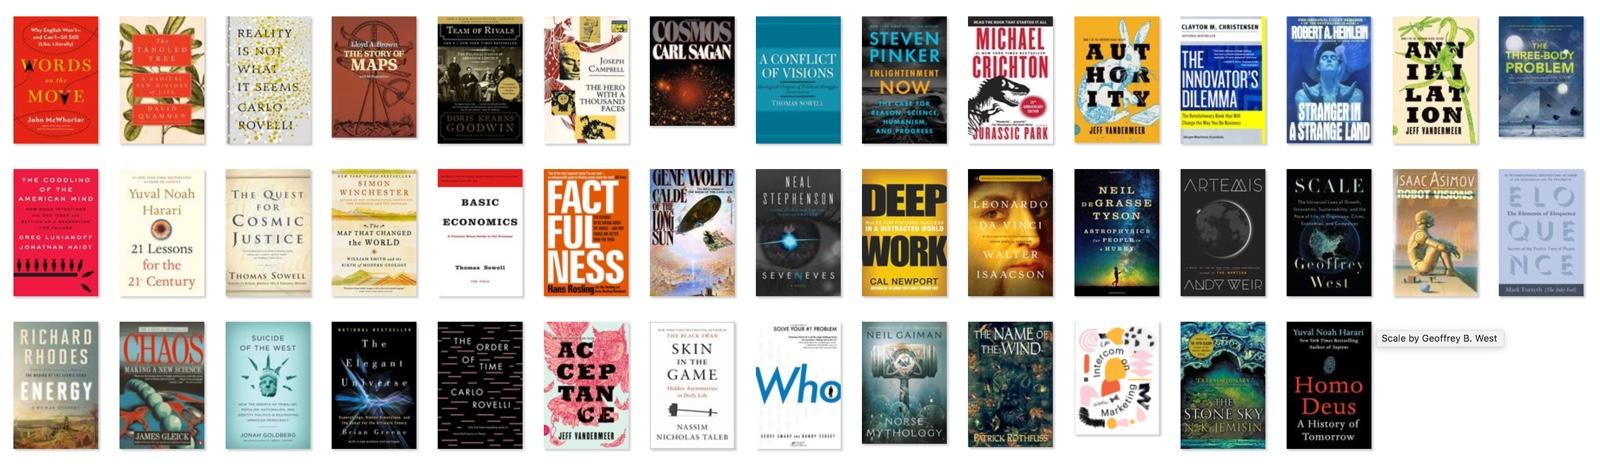 Books of 2018